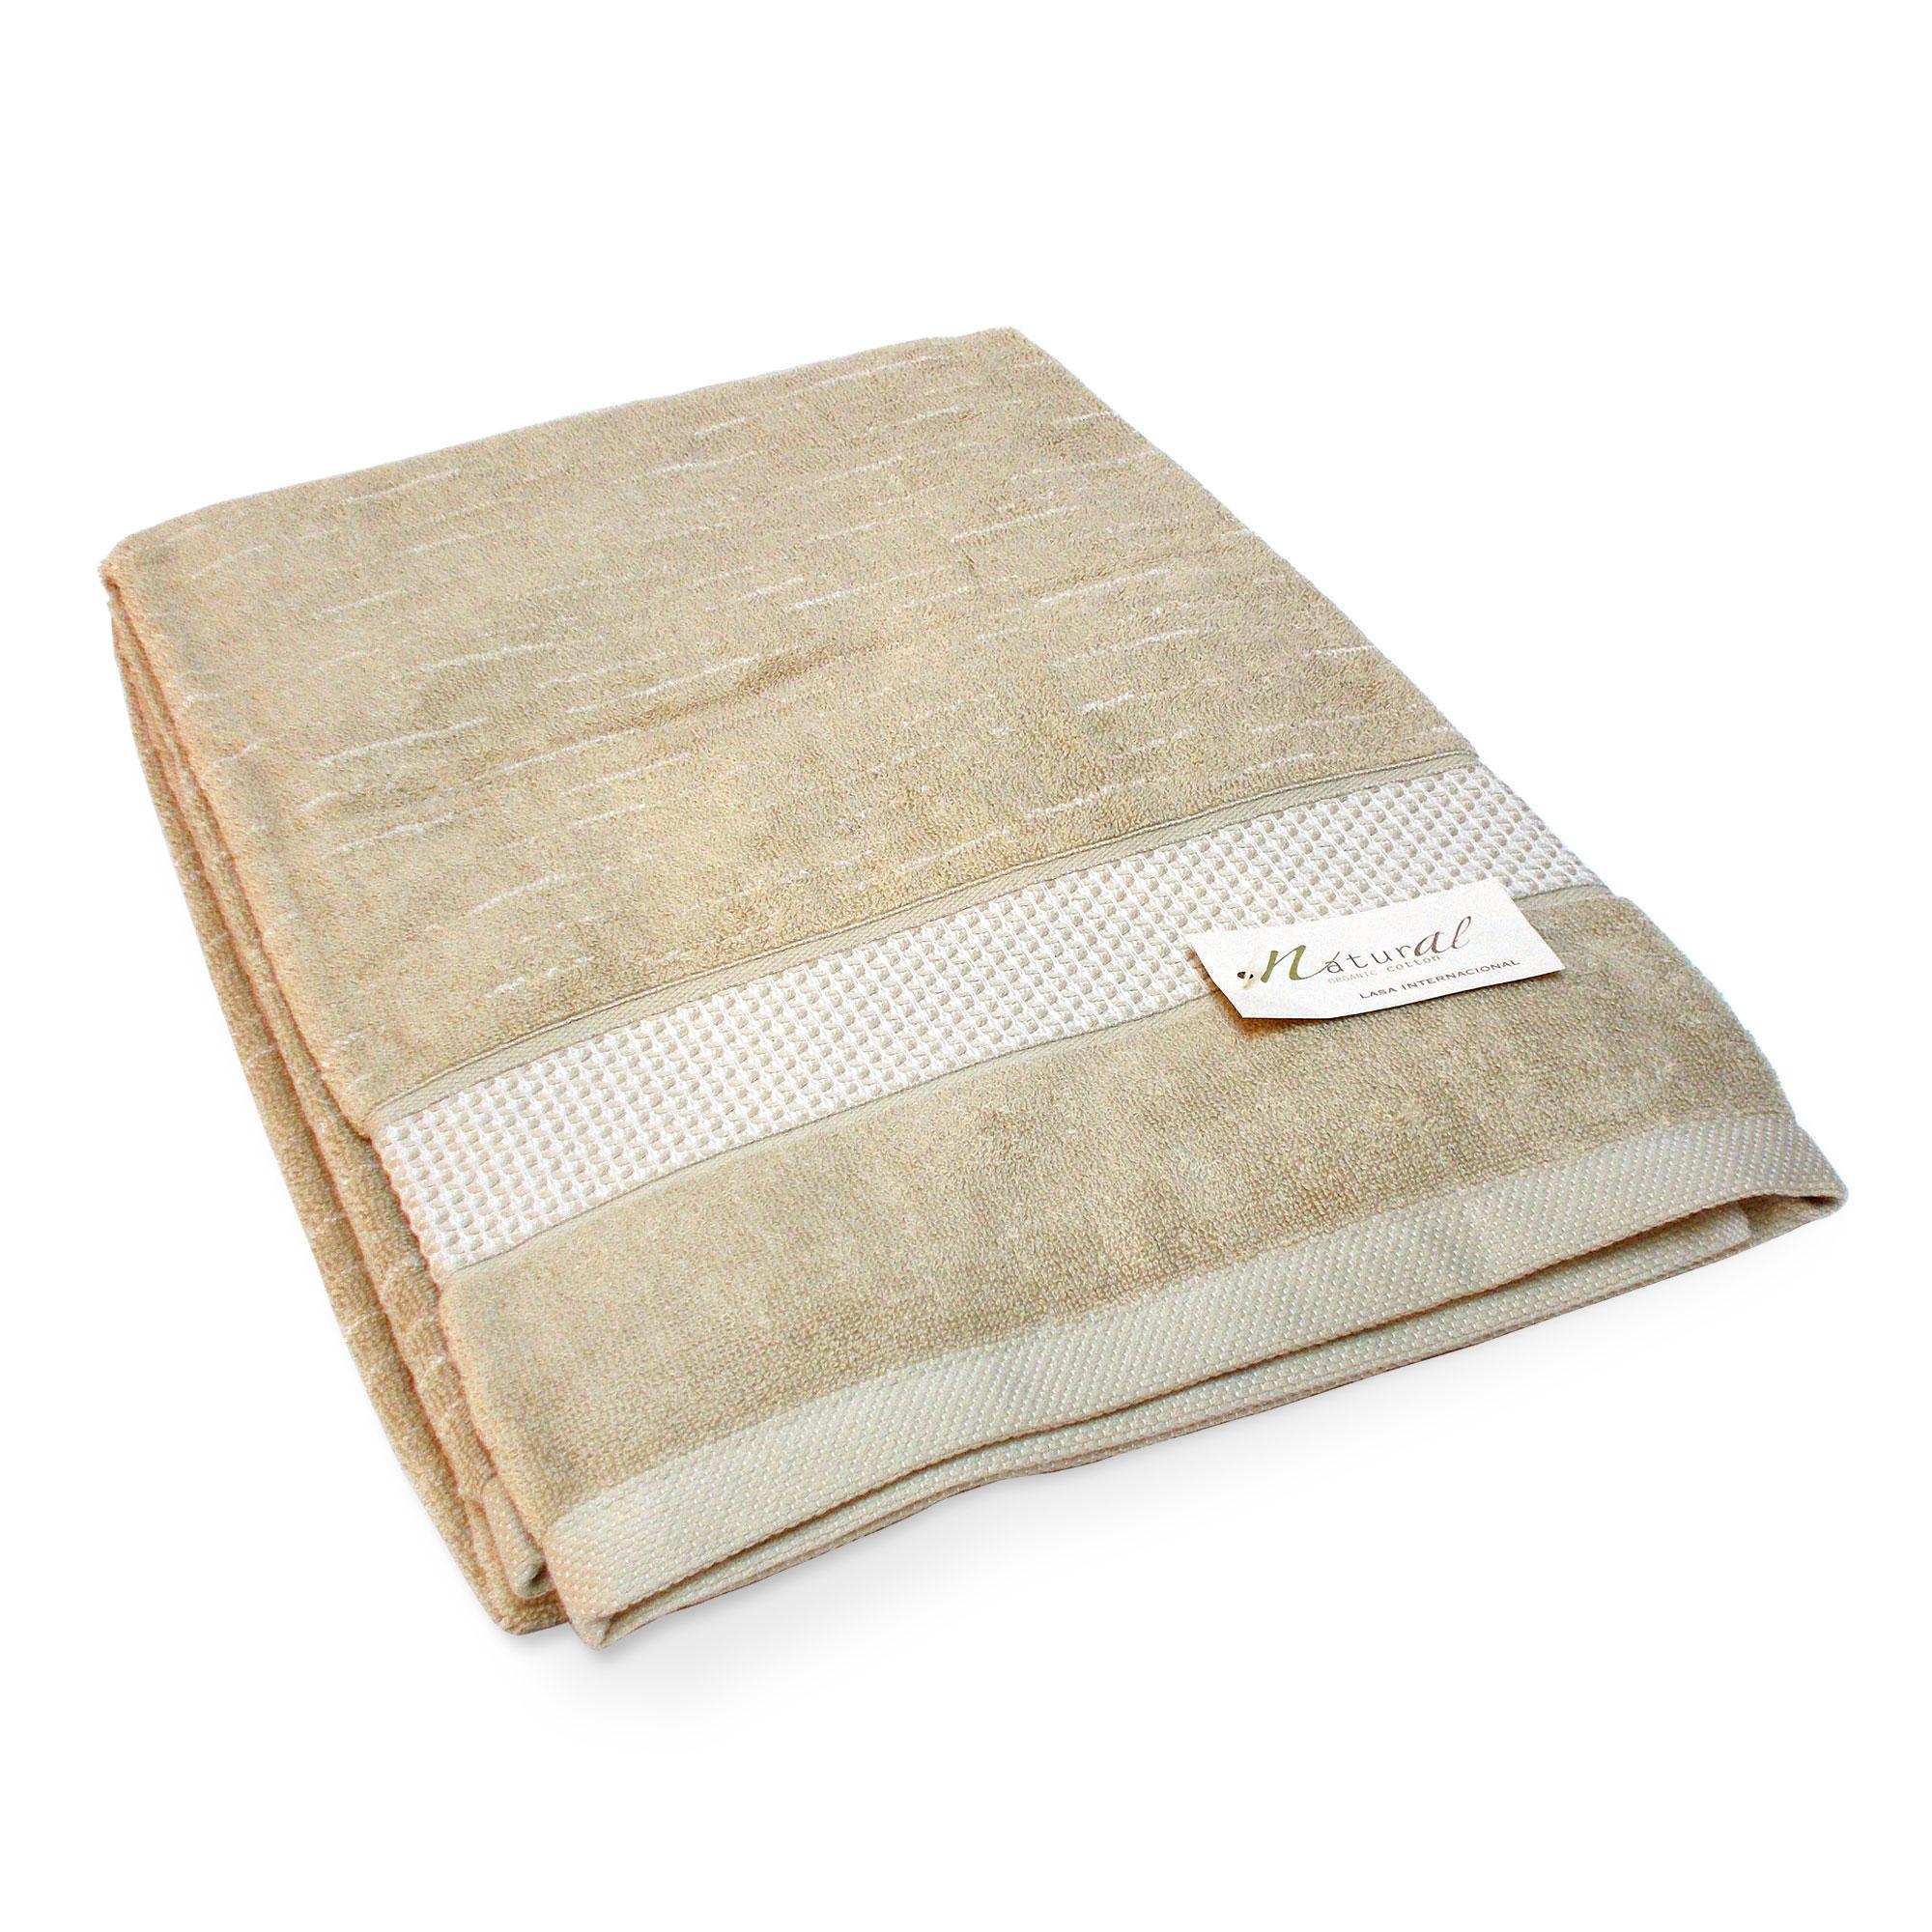 drap de bain 90x200 ficus vert 500g m2 pur coton bio ebay. Black Bedroom Furniture Sets. Home Design Ideas